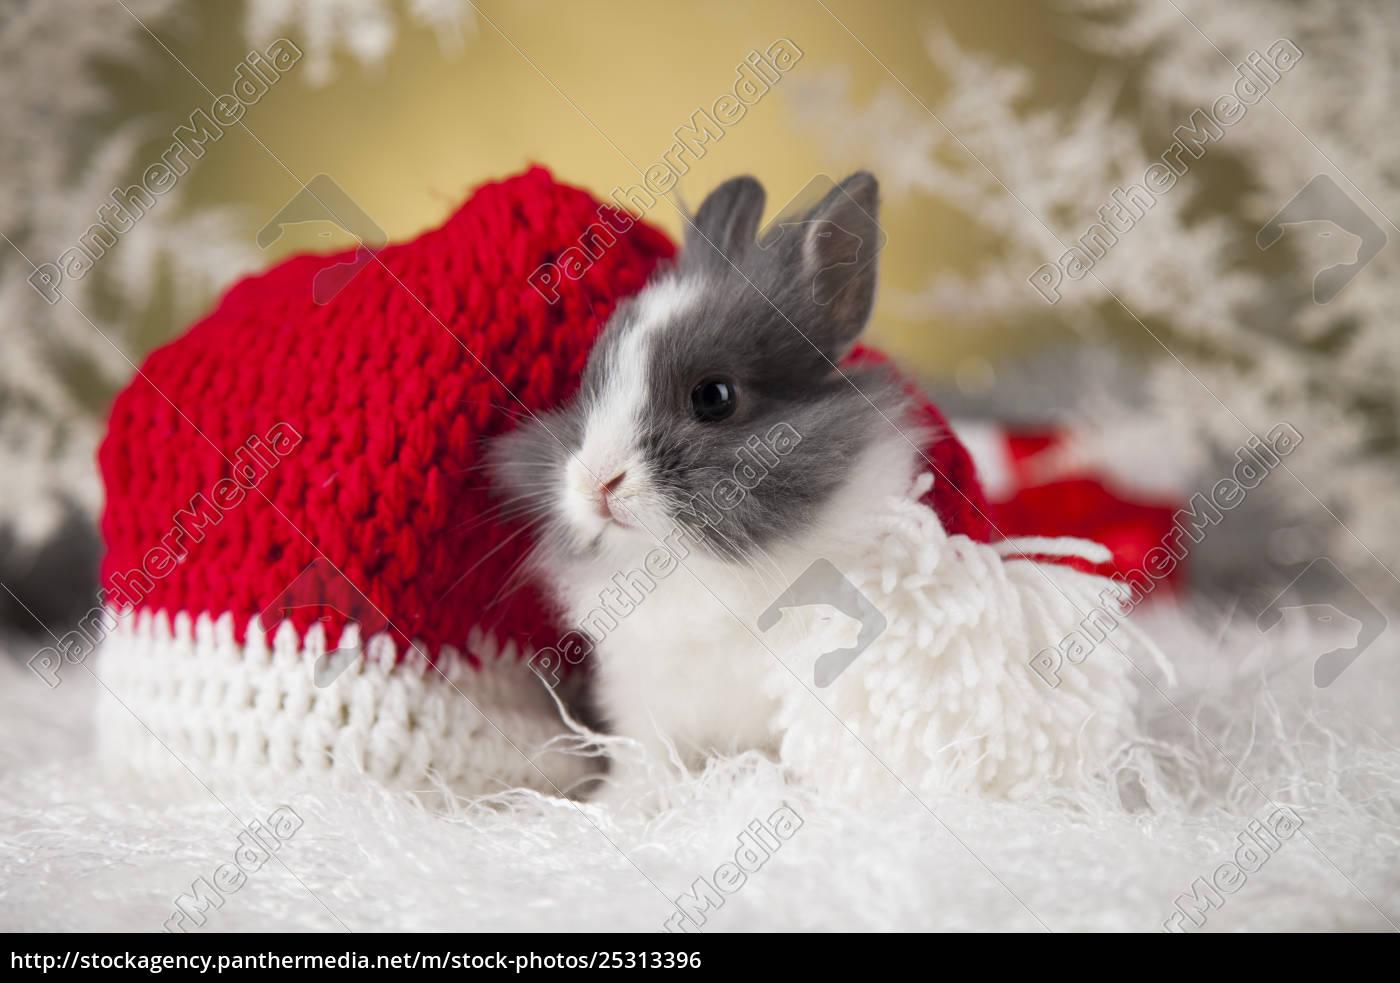 little, santa, bunny, on, christmas, background - 25313396